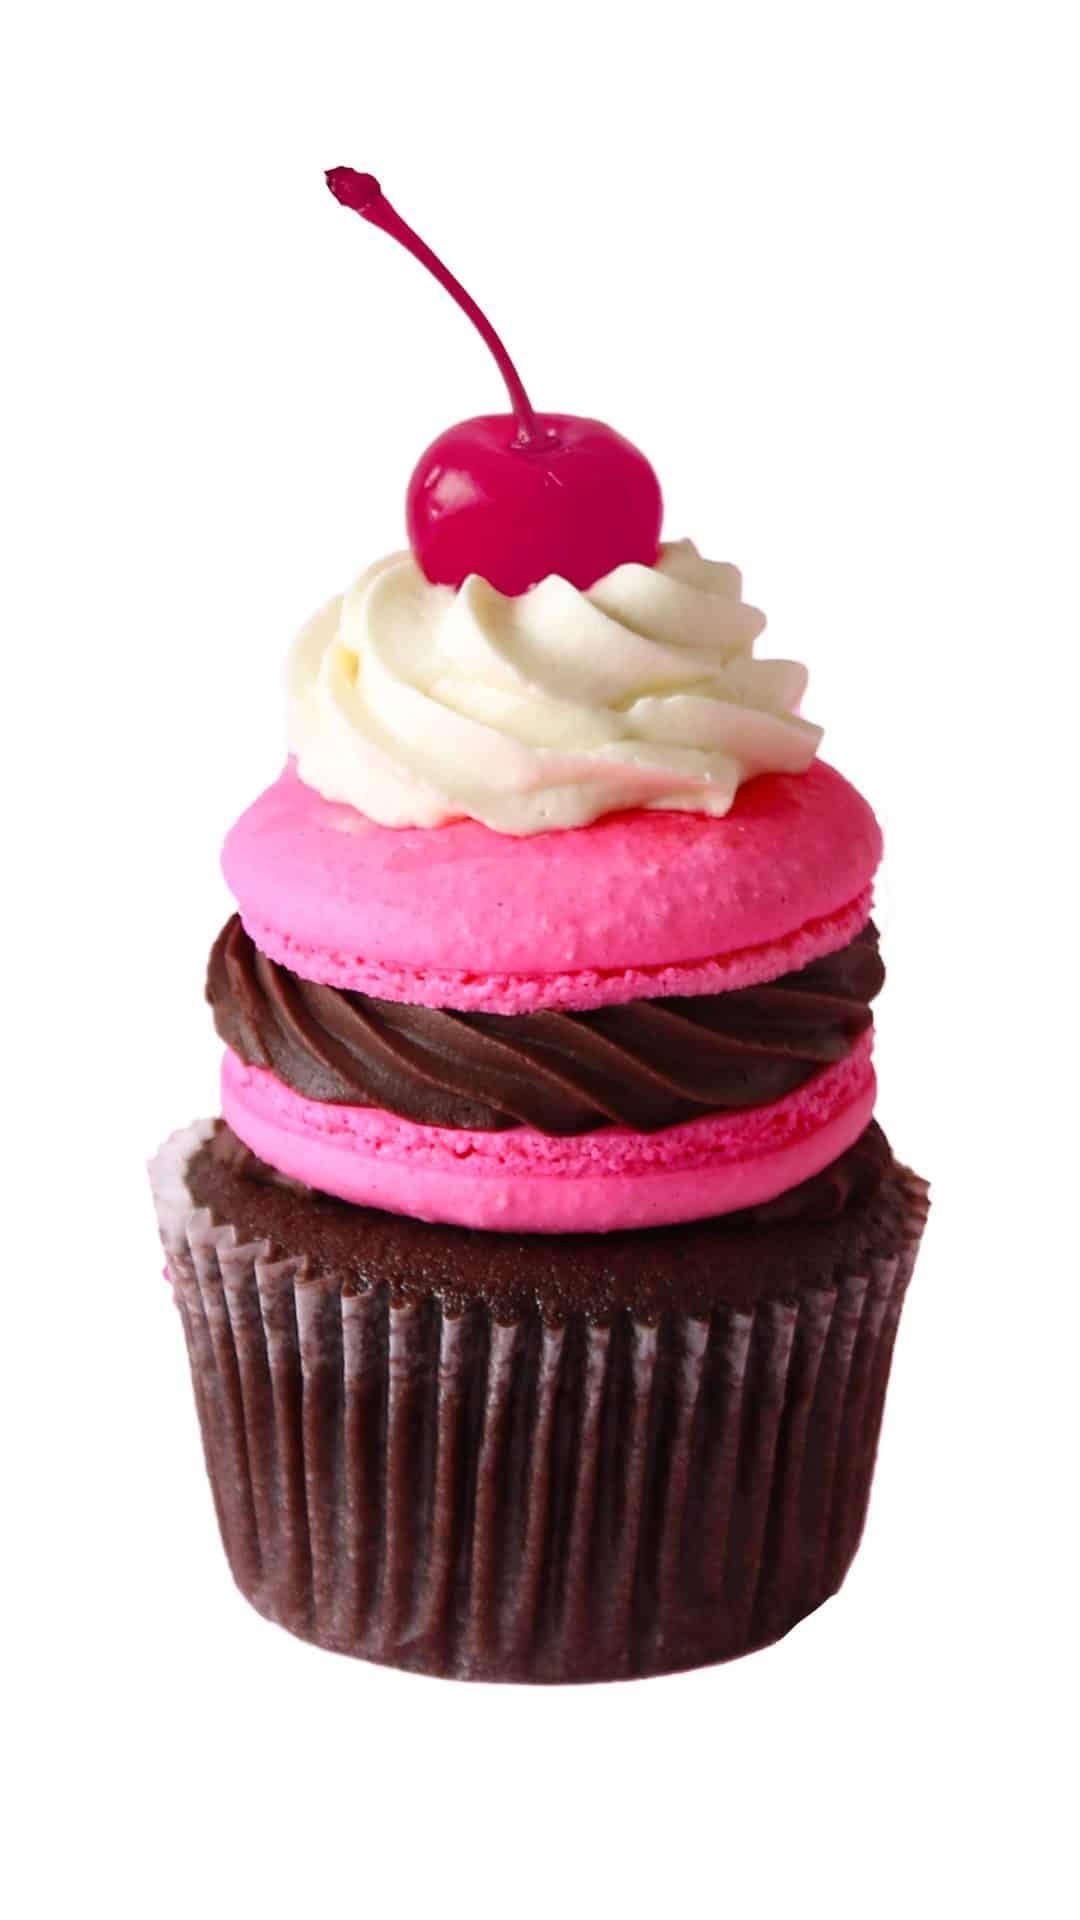 macaron cupcake